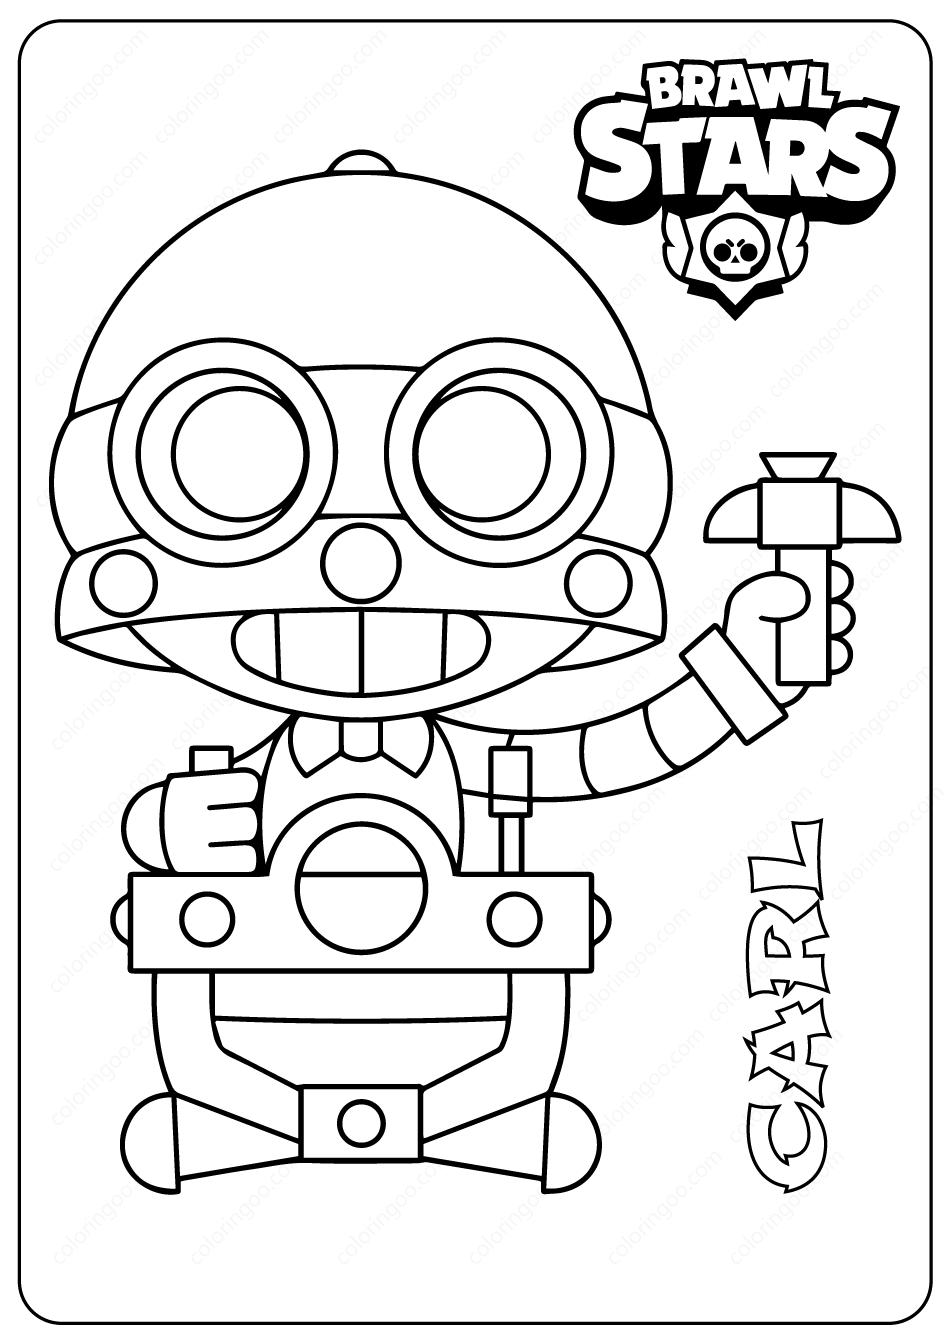 Printable Brawl Stars (Carl) PDF Coloring Pages